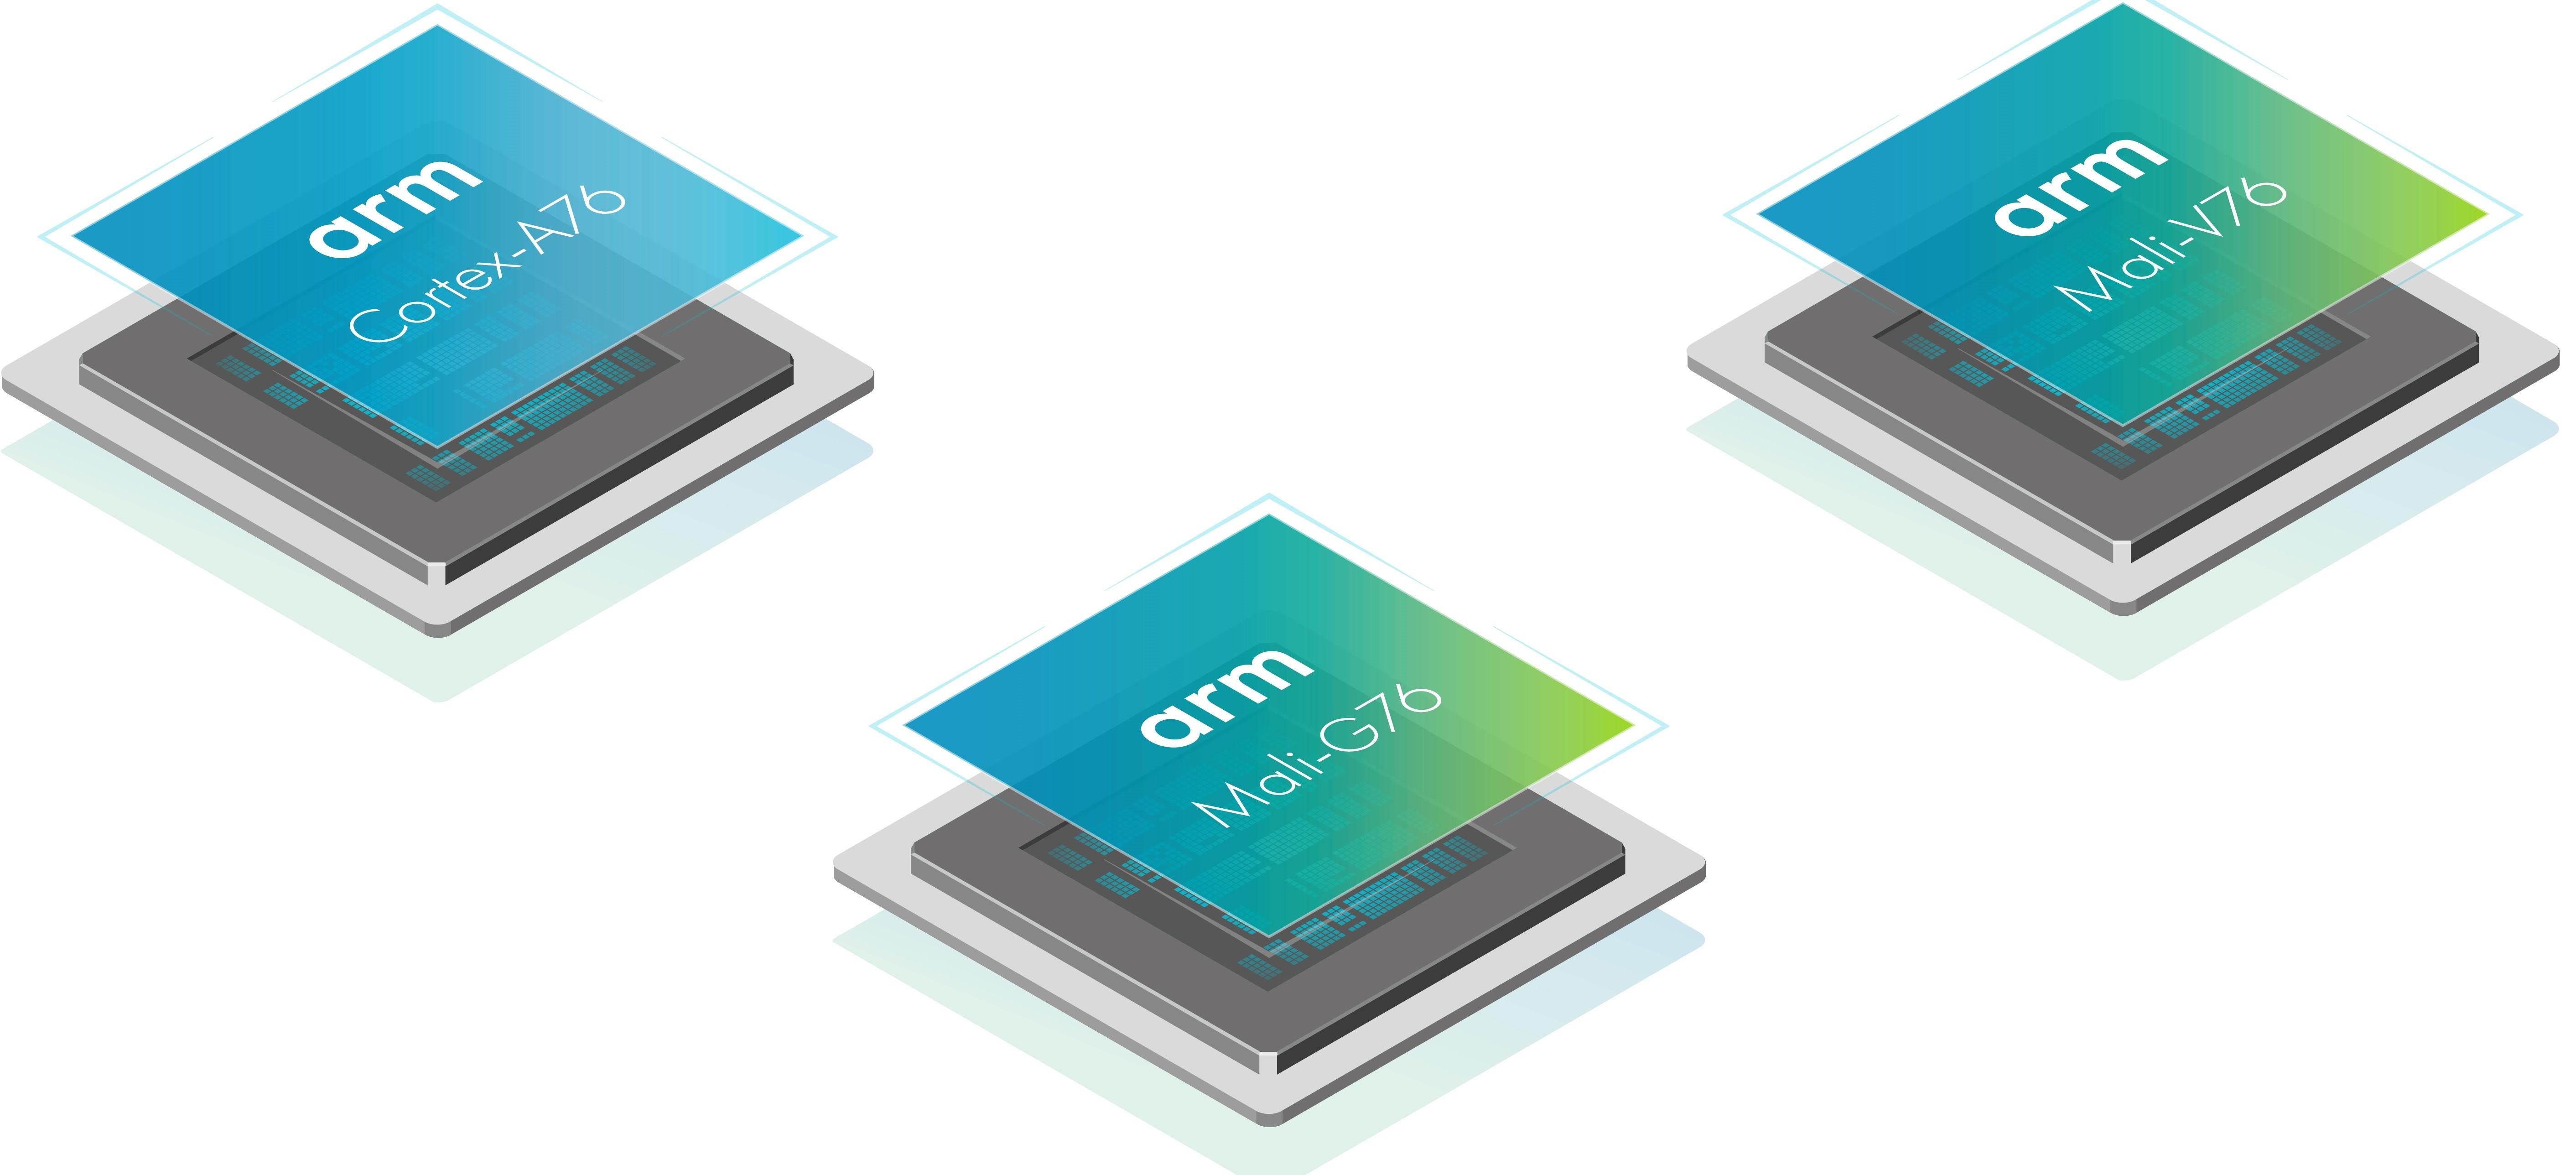 ARM giới thiệu Cortex-A76 & Mali-G76, sẽ có mặt trên Samsung Exynos cho Galaxy S10?